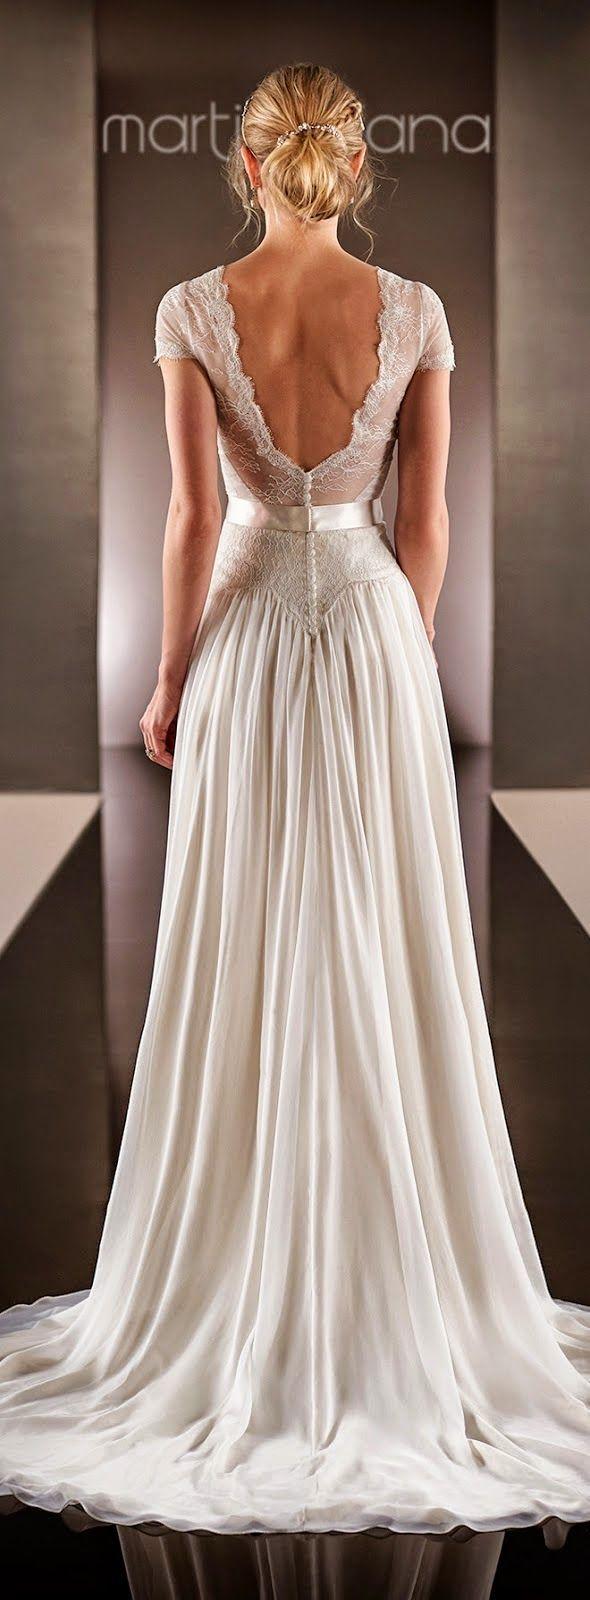 Robe de mariée avec dentelle et joli drapé...